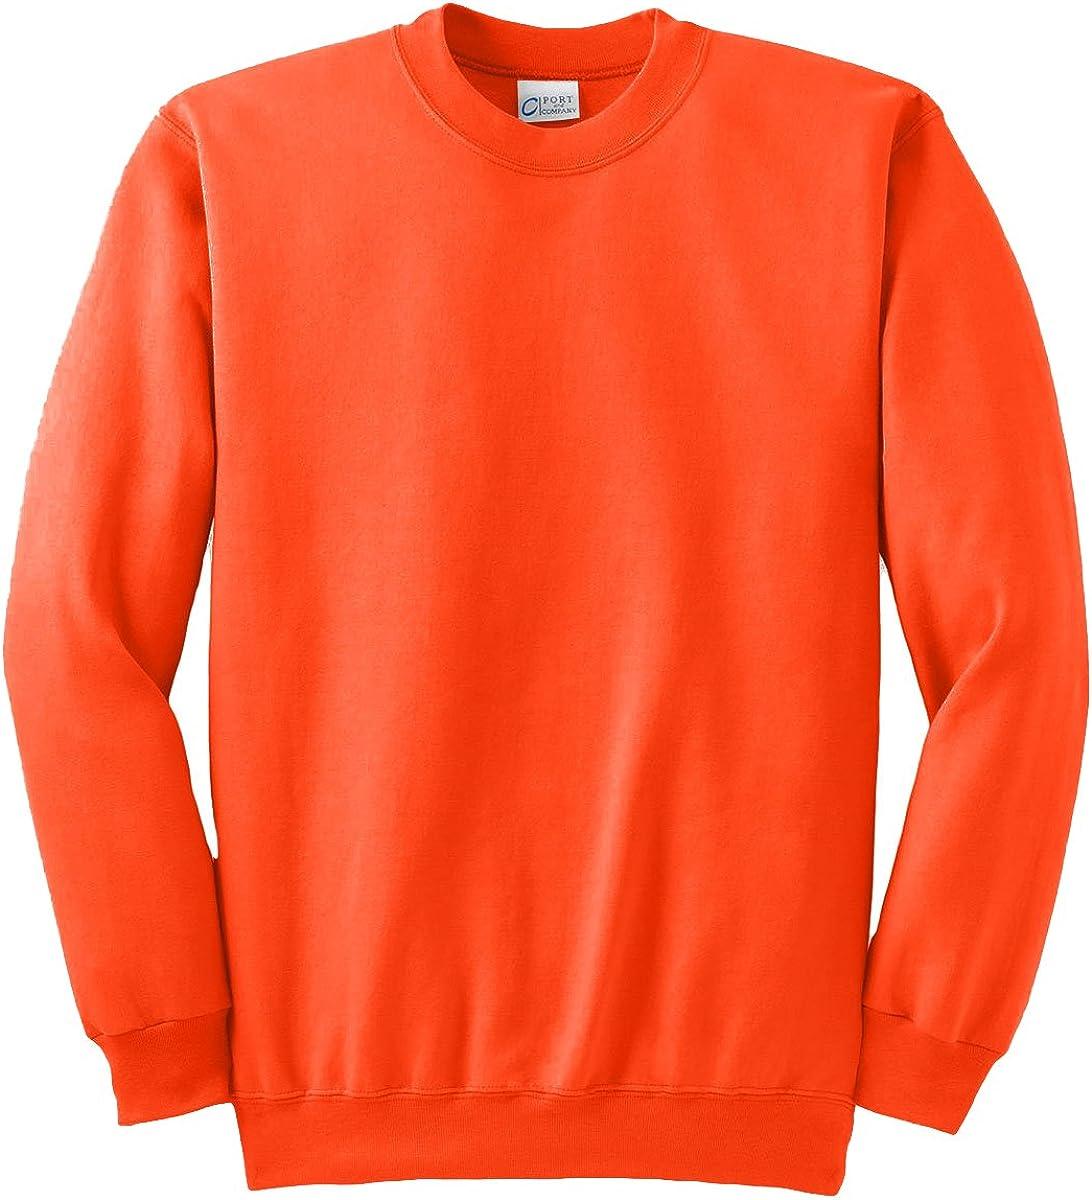 Port & Company Tall Ultimate Crewneck Sweatshirt>4XLT Safety Orange PC90T